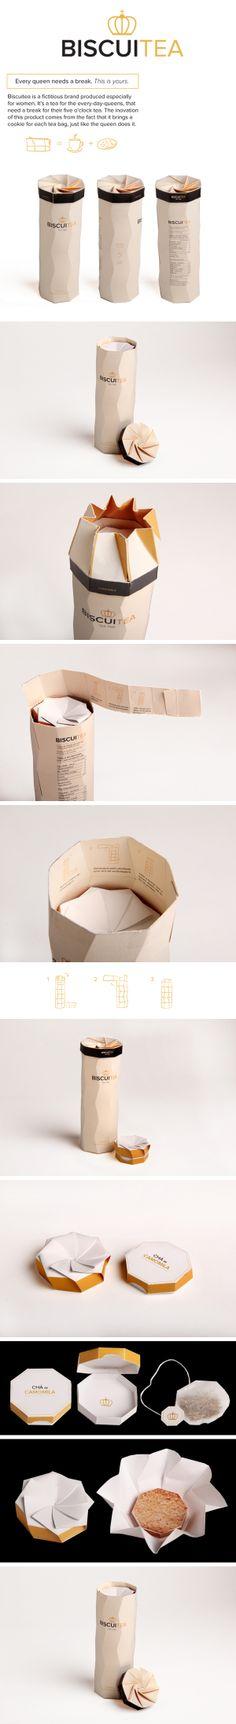 Biscuitea Packaging